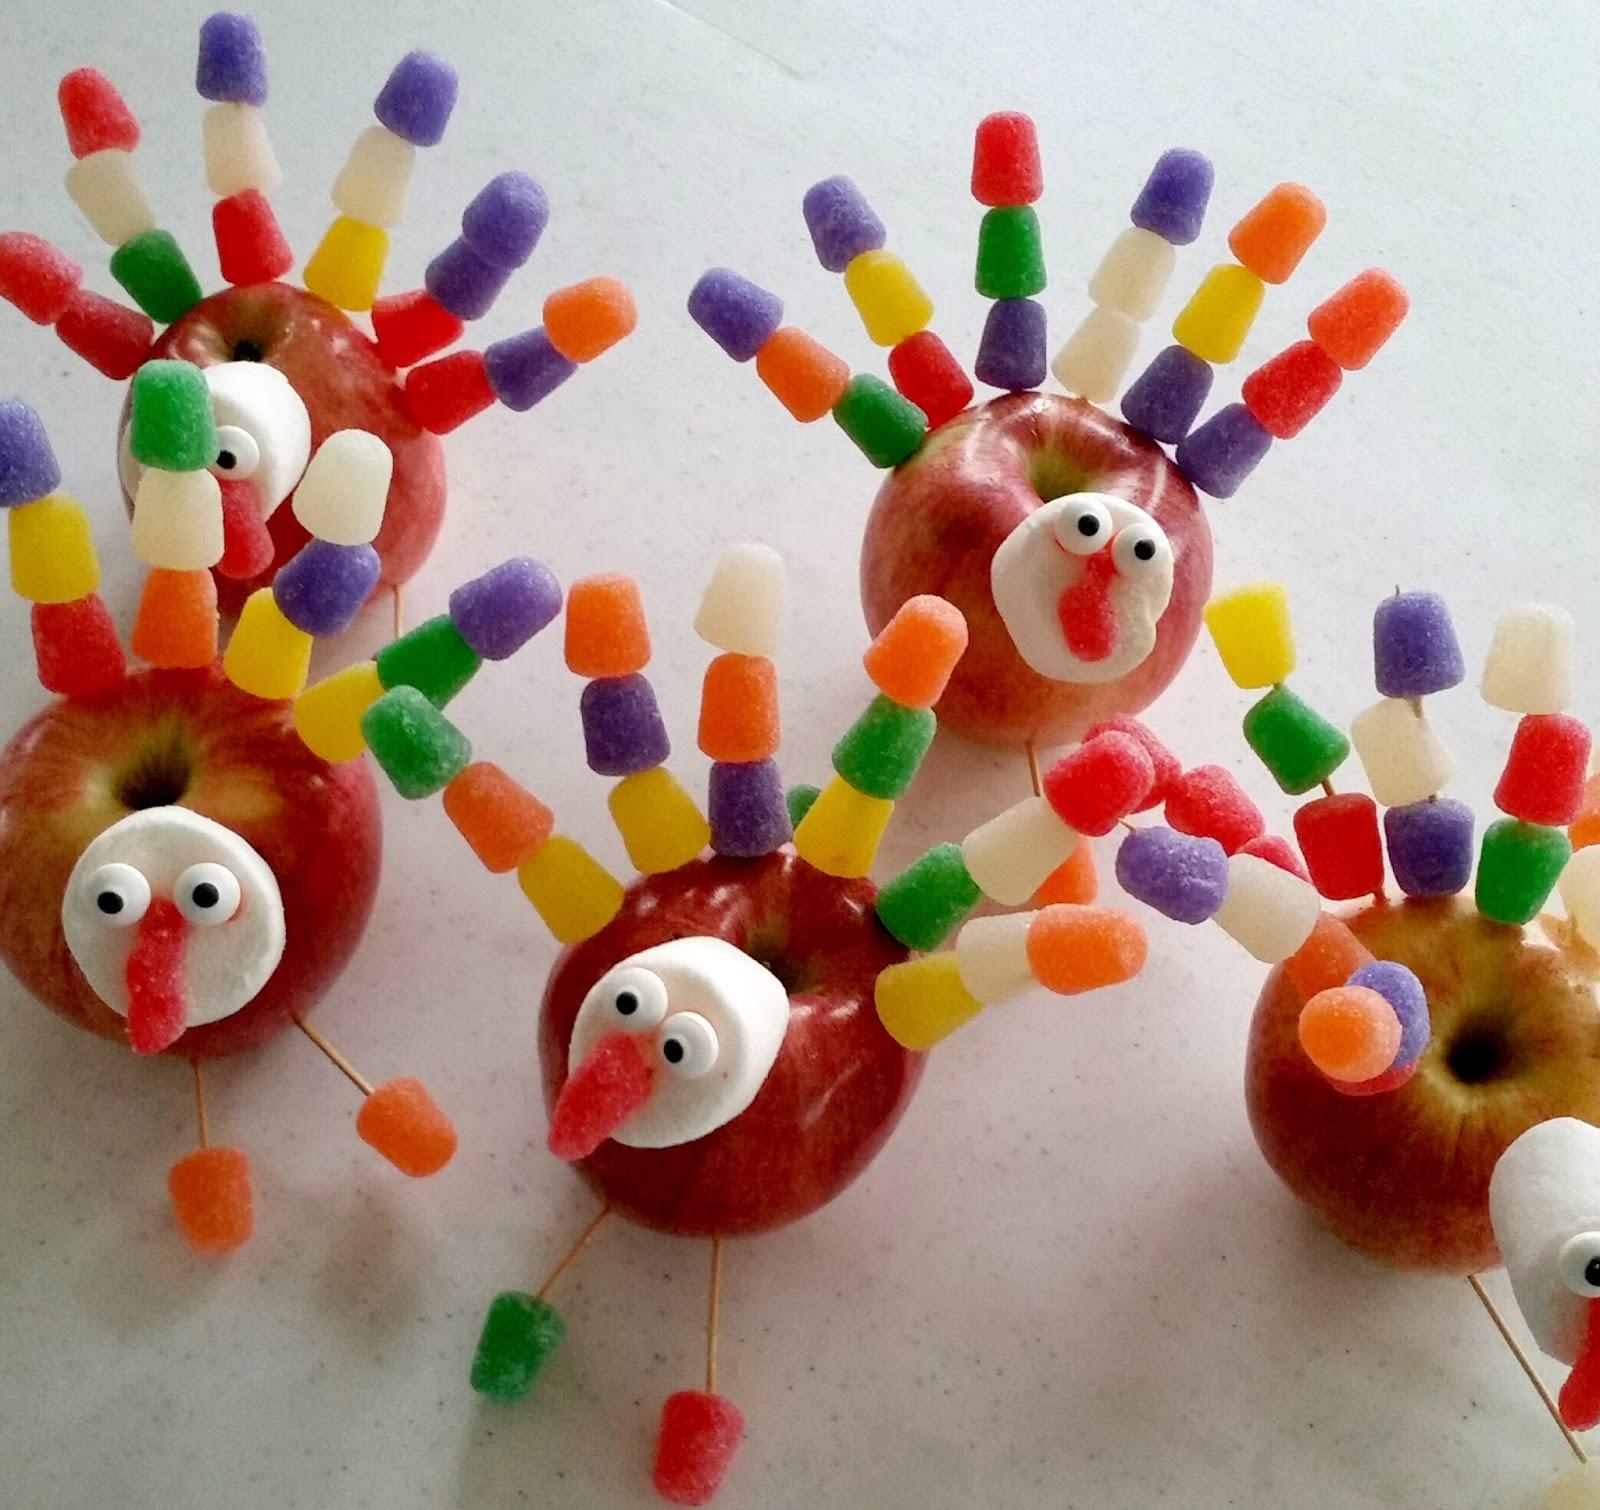 19 Edible Turkey Crafts Thanksgiving Crafts: The Better Baker: Edible Apple Turkey Craft